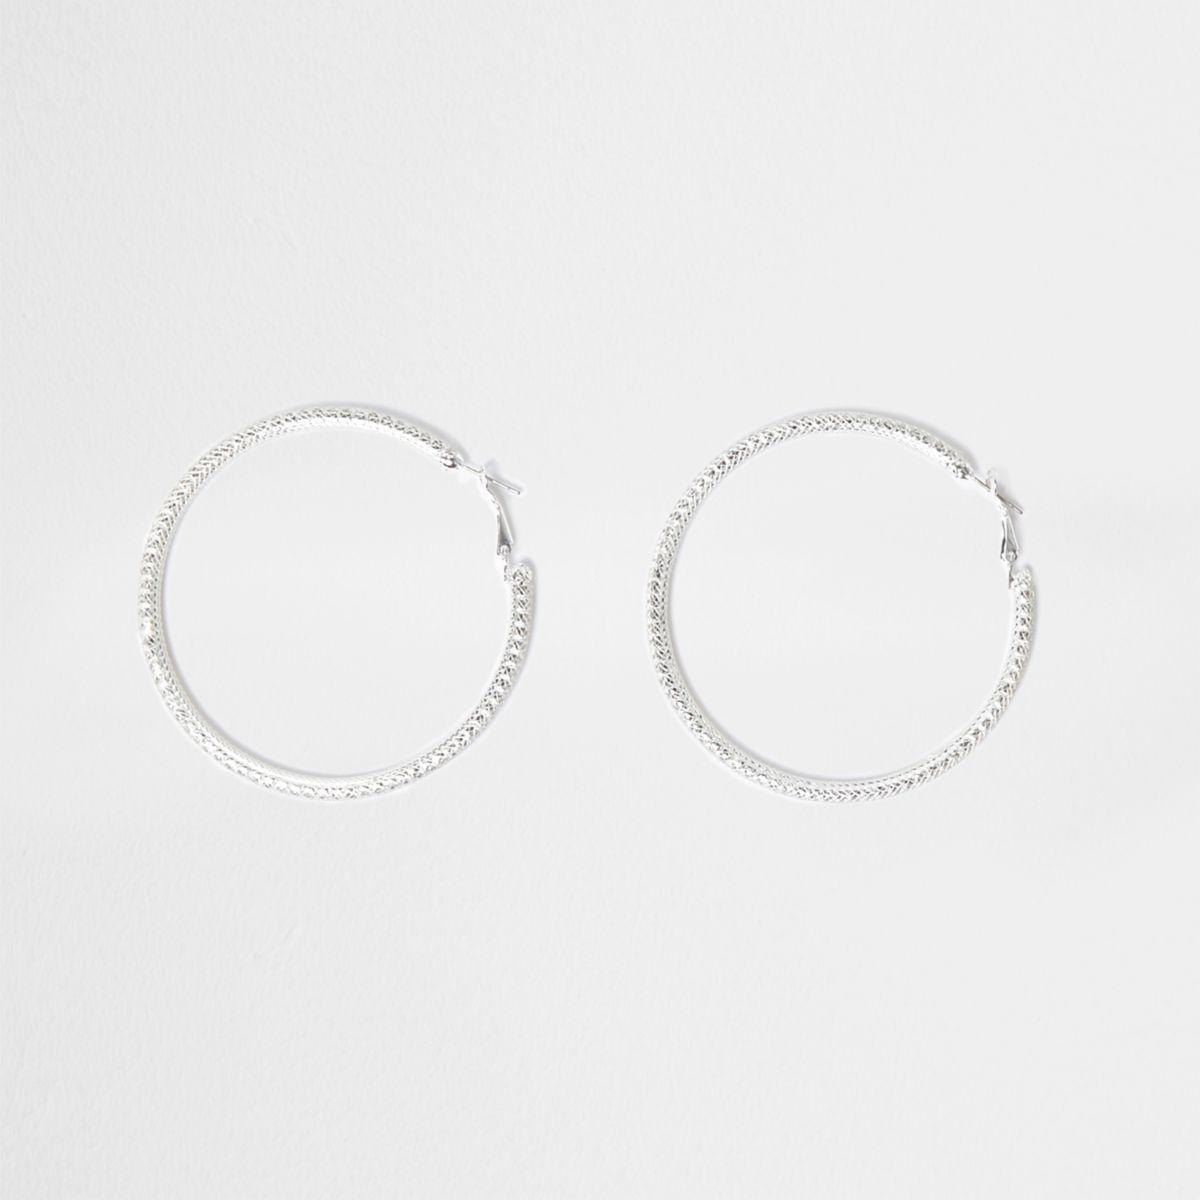 Silver tone rhinestone cup chain hoop earrings